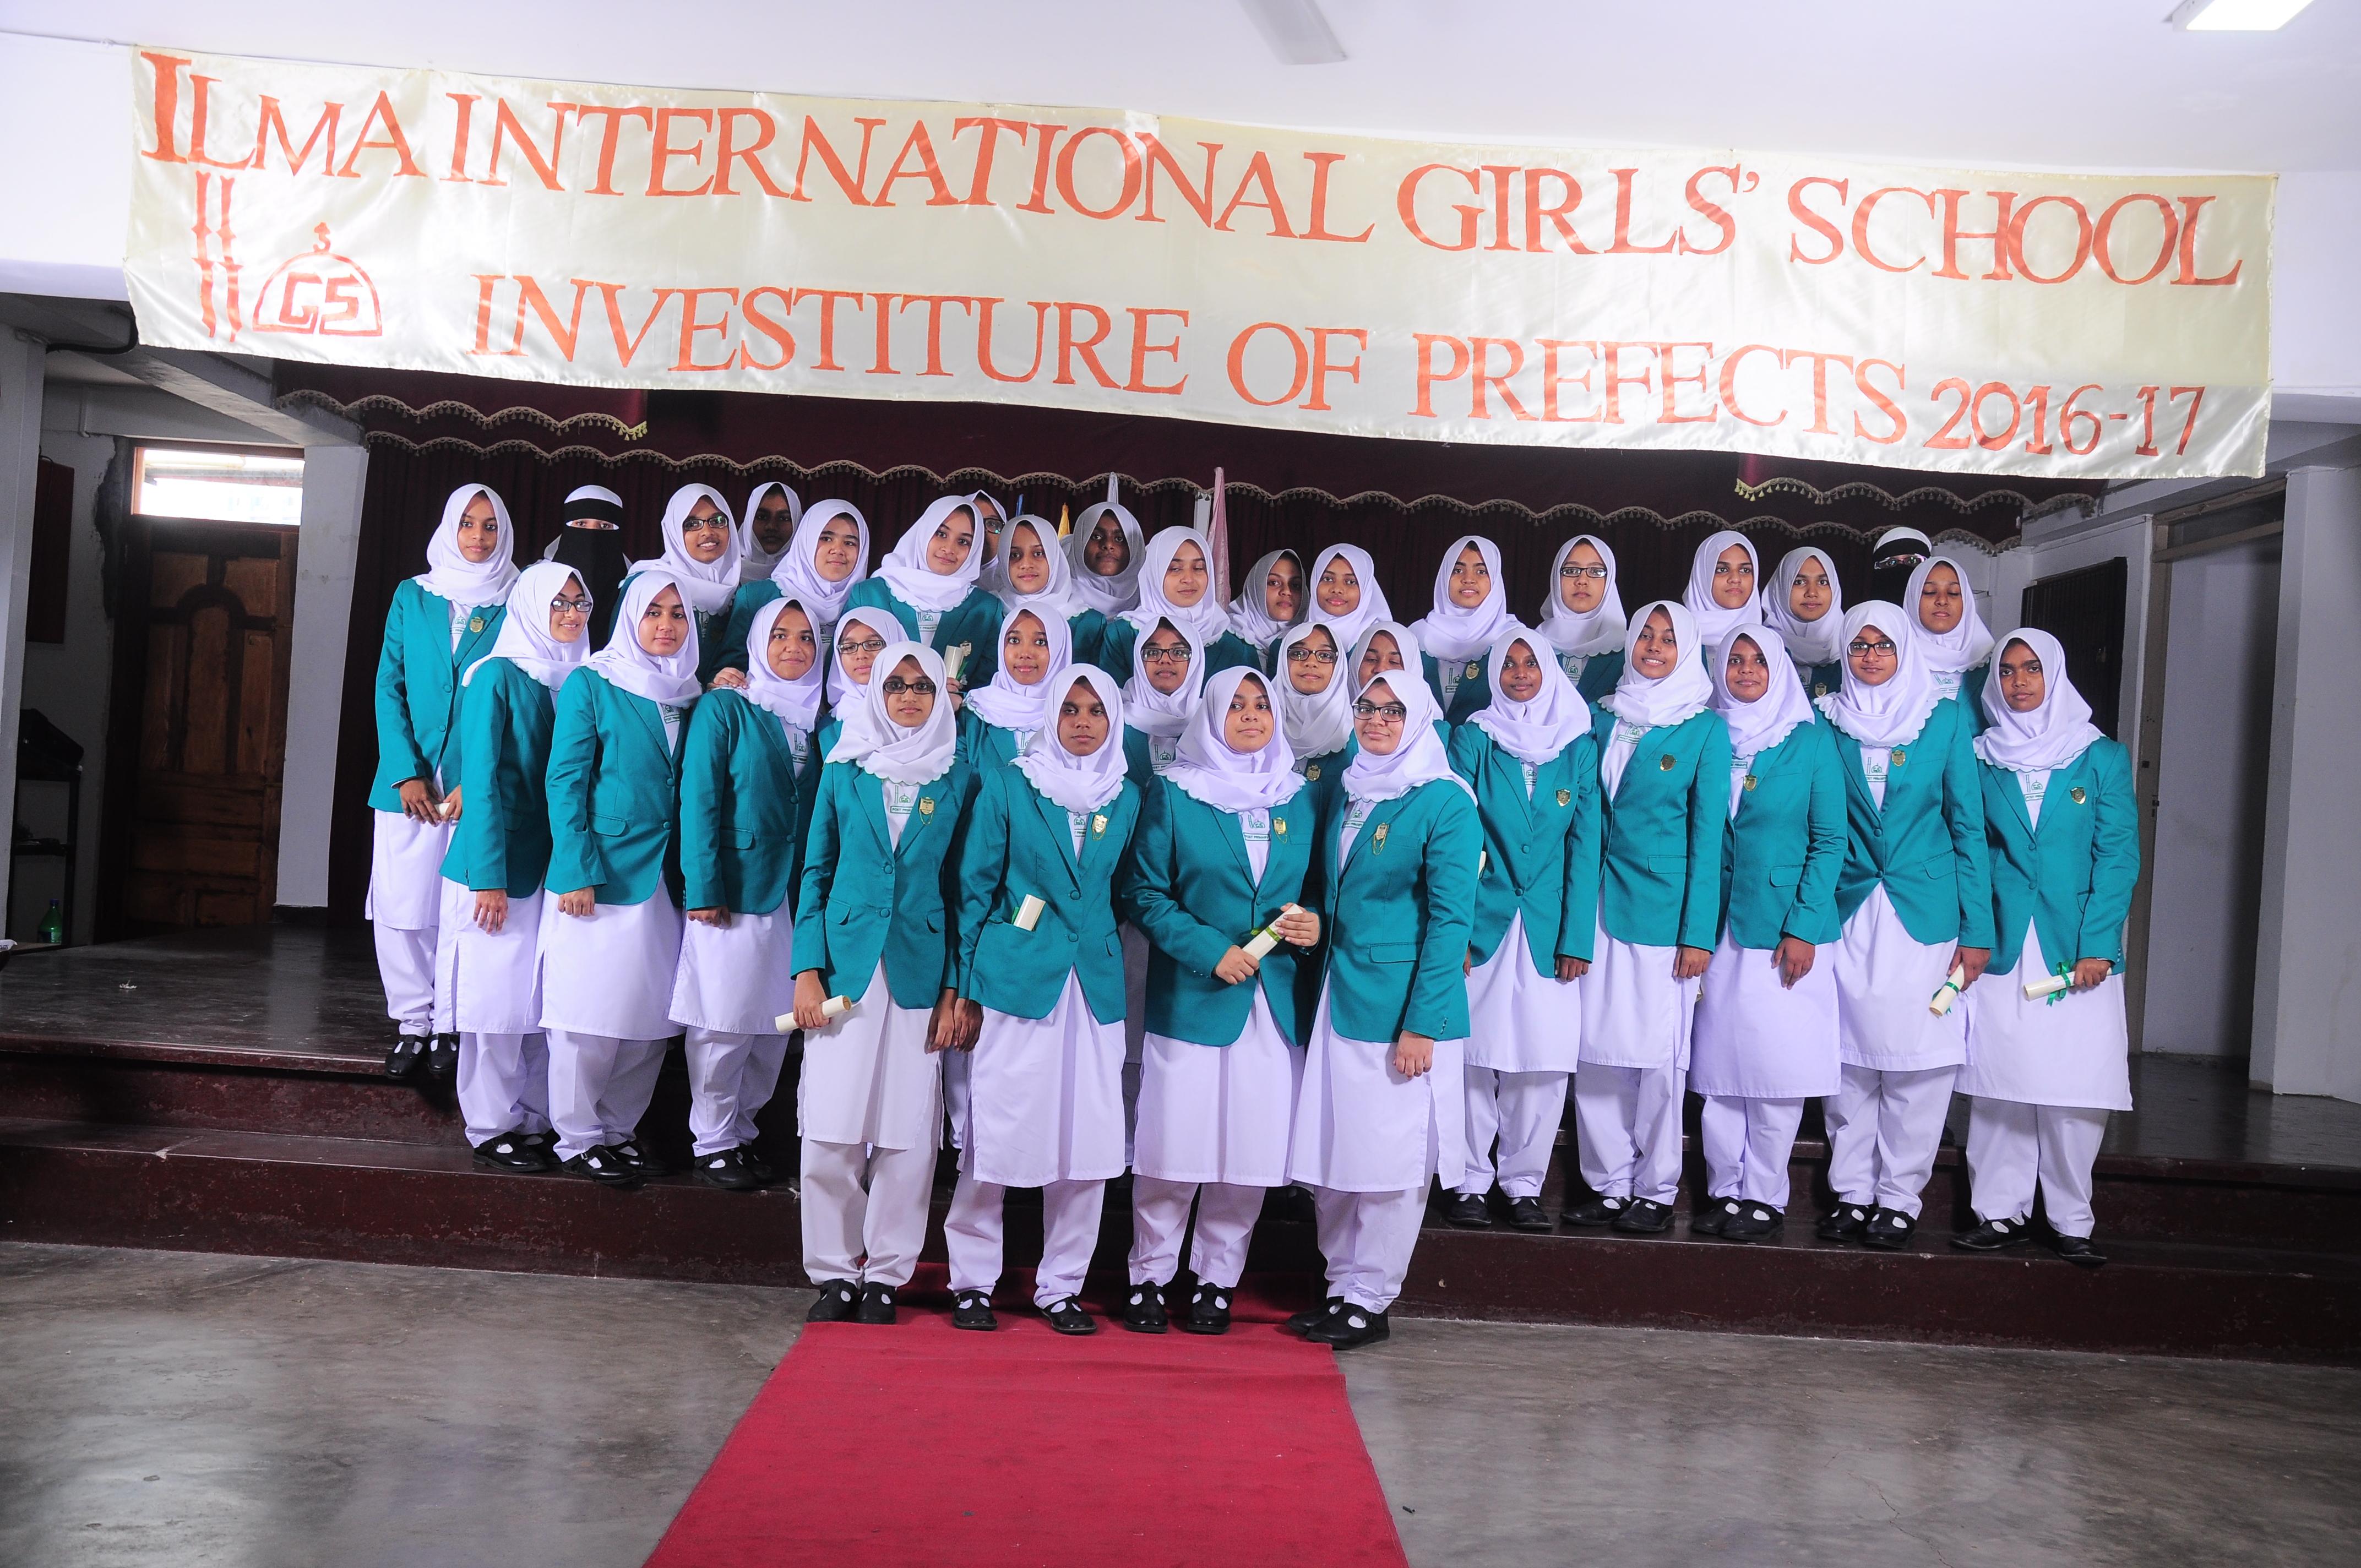 Investiture of Senior Prefects 2016/17 - Ilma International Girls ...